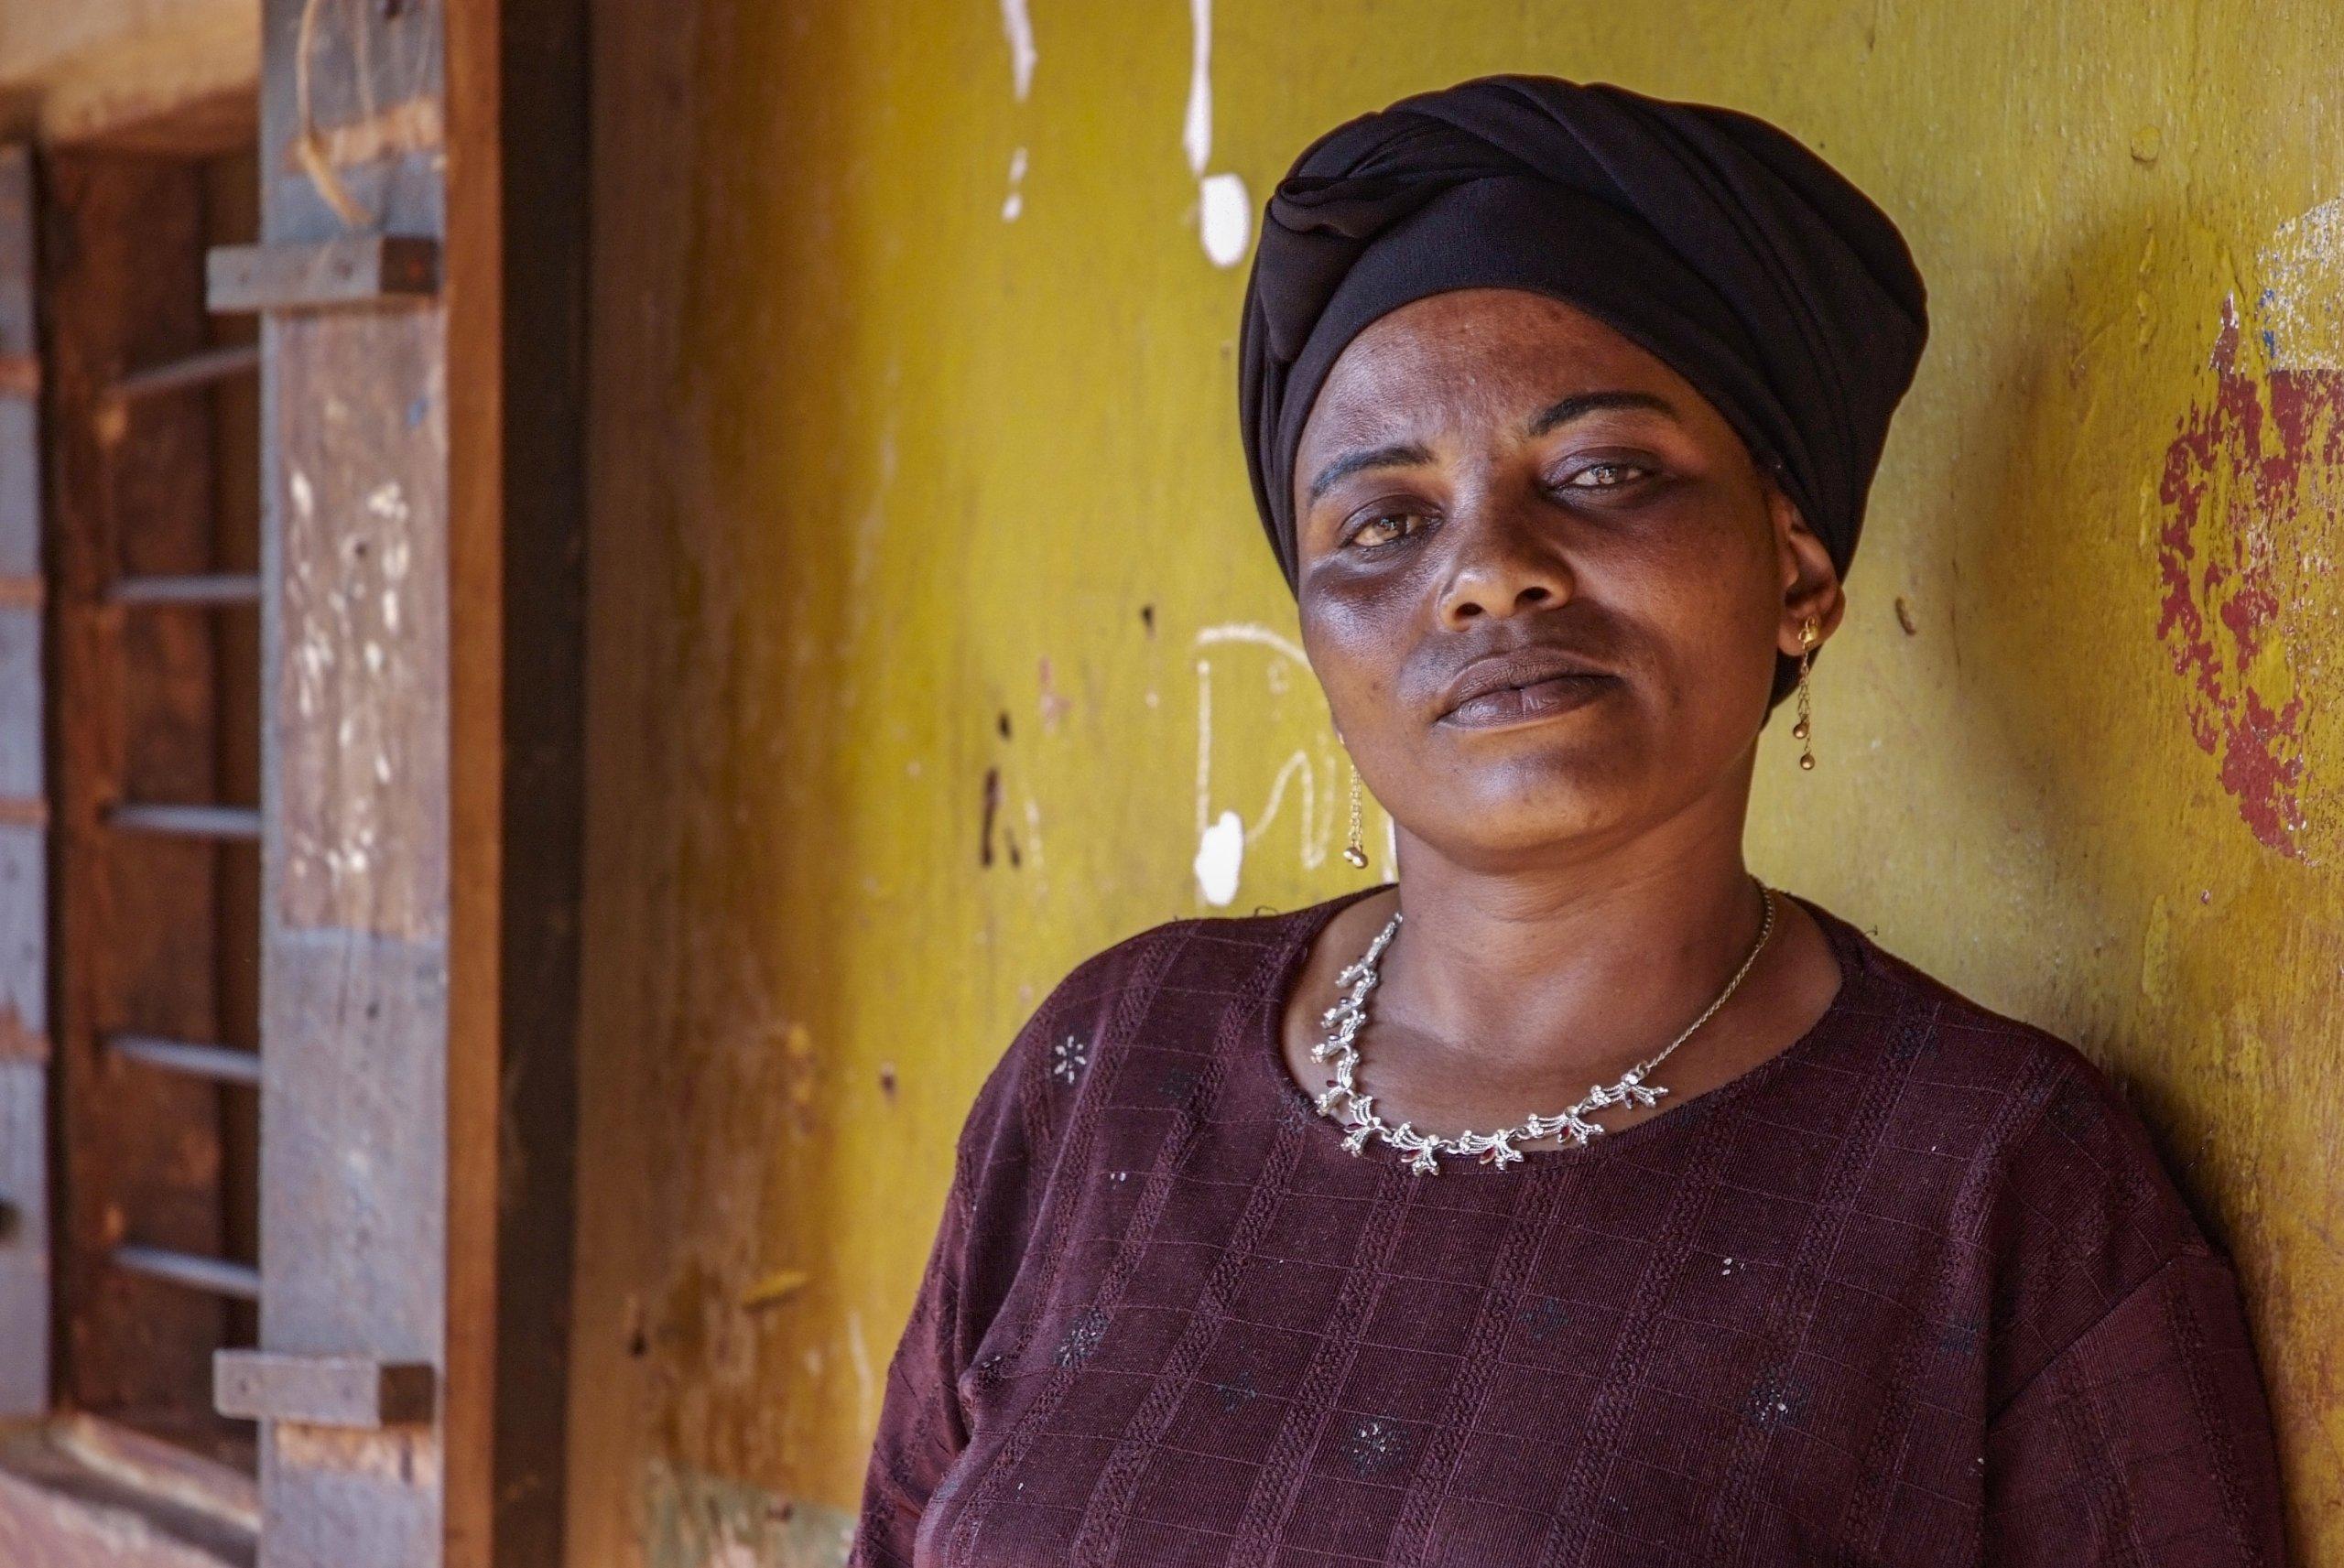 38 03 boerin trotsevrouw Mwajuma Abdalah Maramba Tanzania 6240 scaled